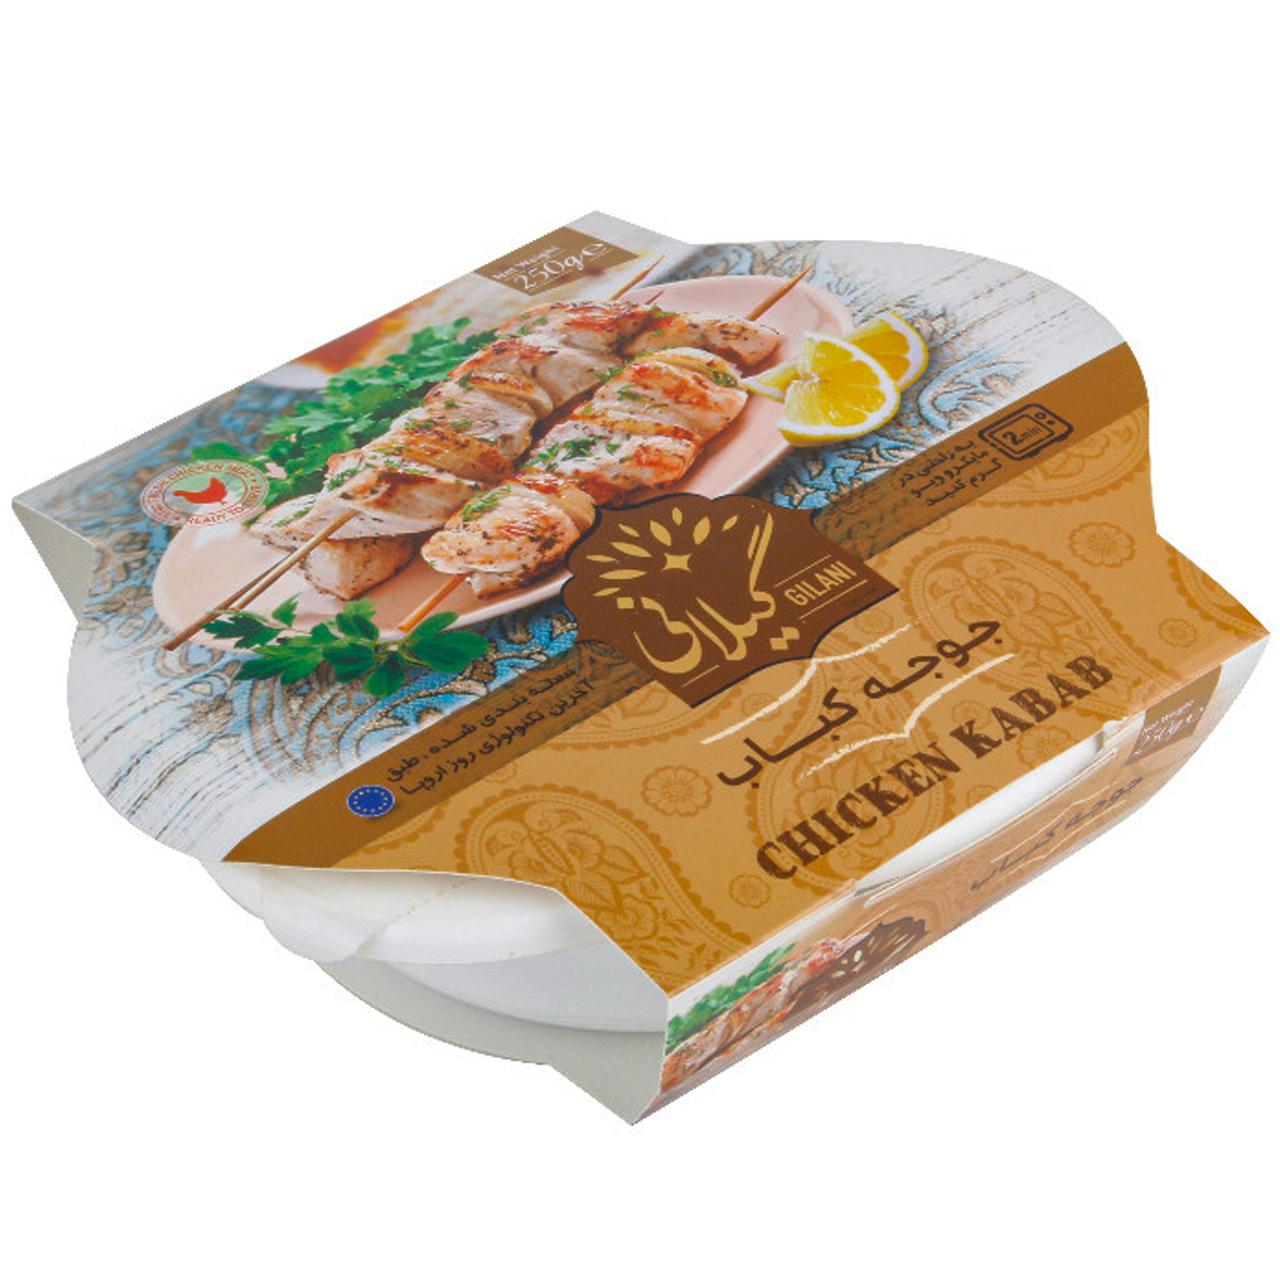 جوجه کباب گیلانی - 250 گرم